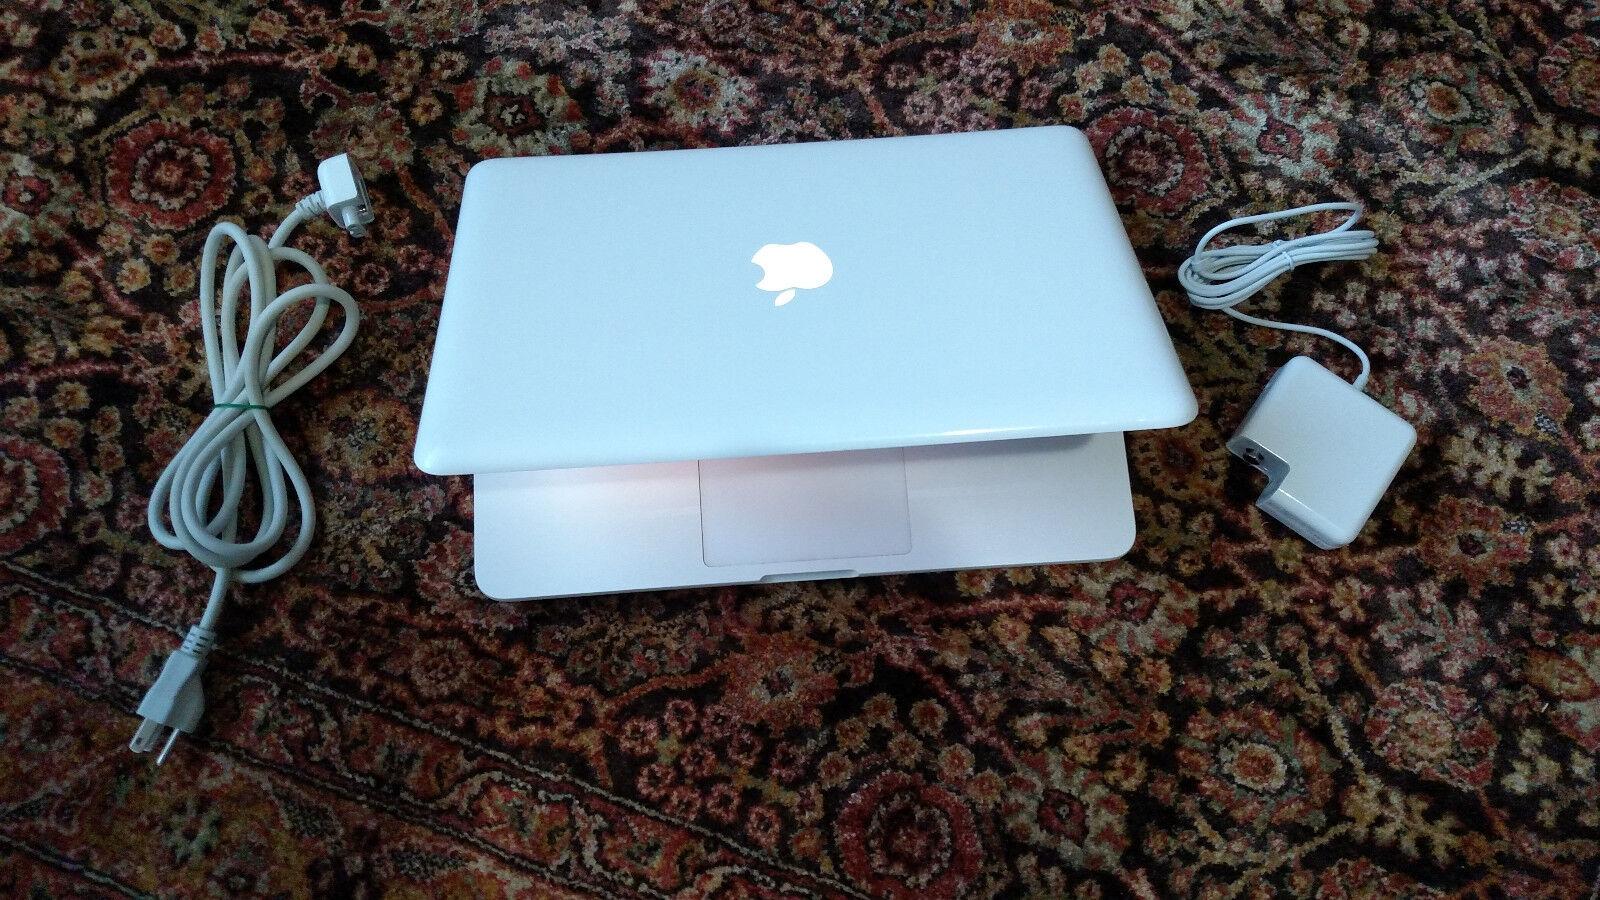 "Apple MacBook White 13"" a1342 NEW 1TB HDD, New 8 GB Ram 2.26 GHz. LATEST MAC OS"